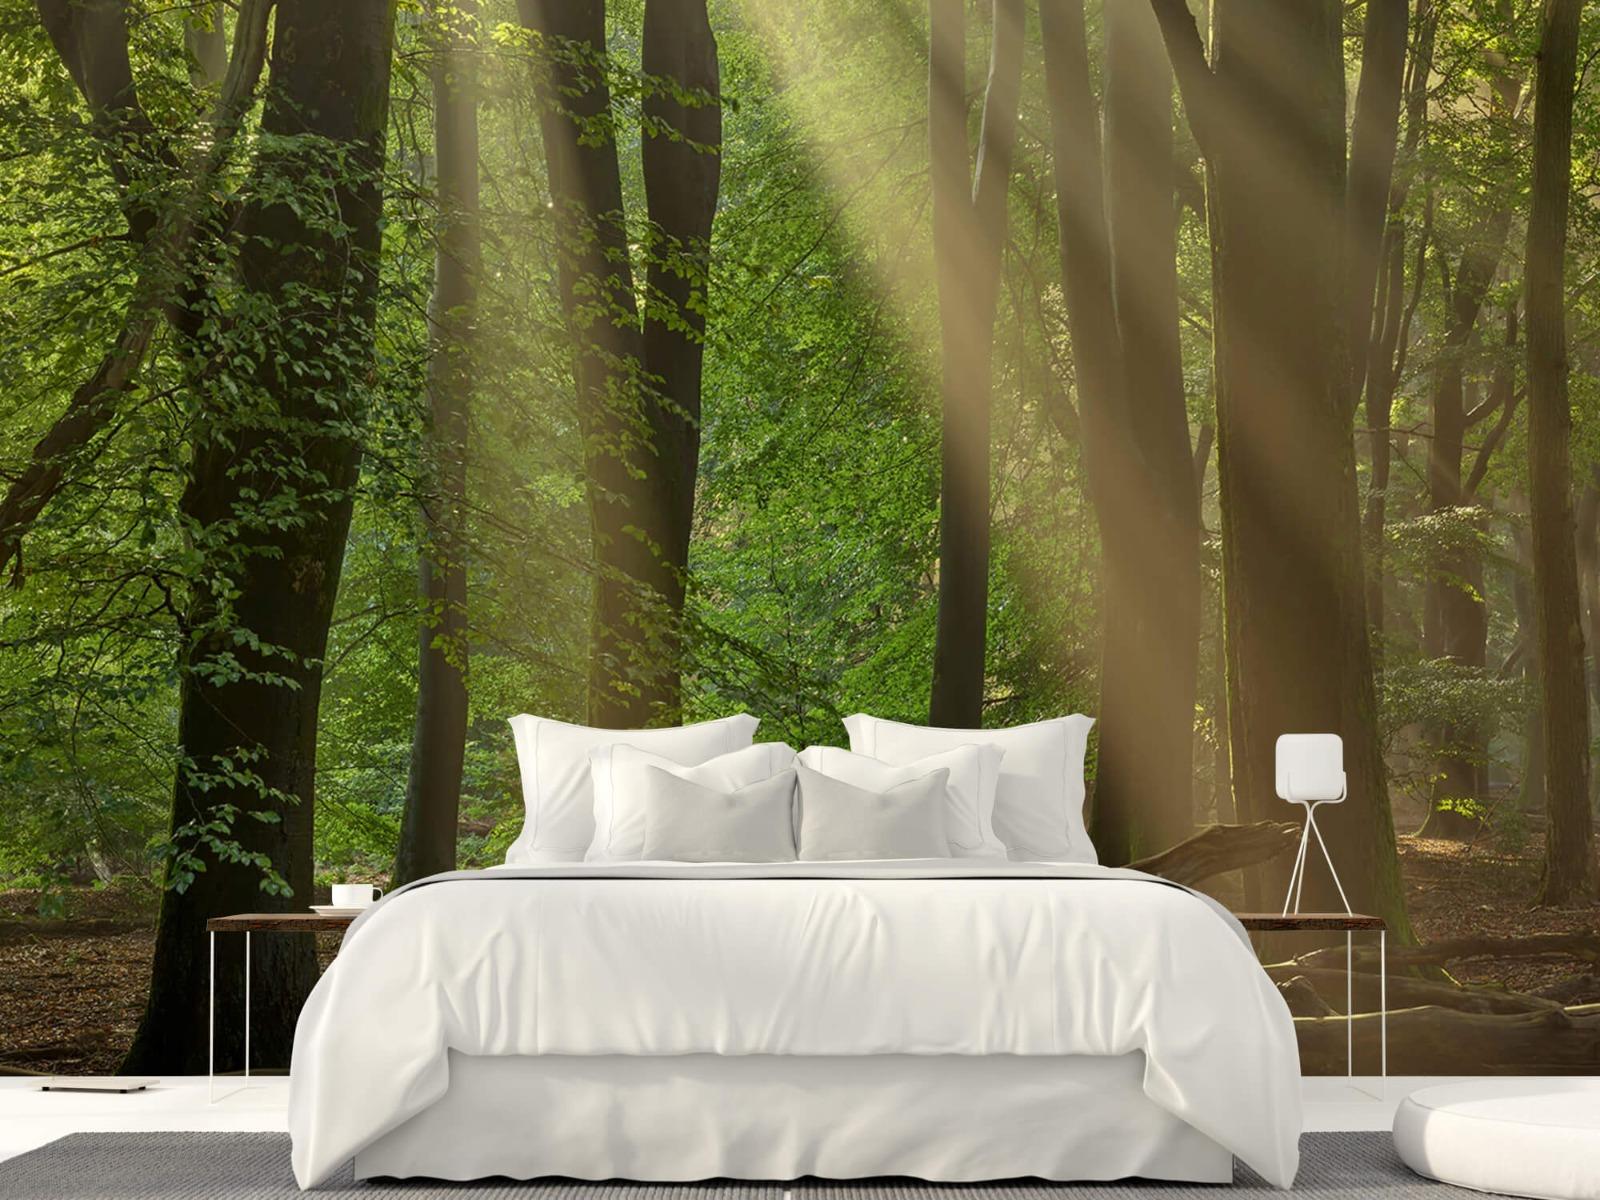 Bomen - Zonneharpen in het bos - Slaapkamer 22